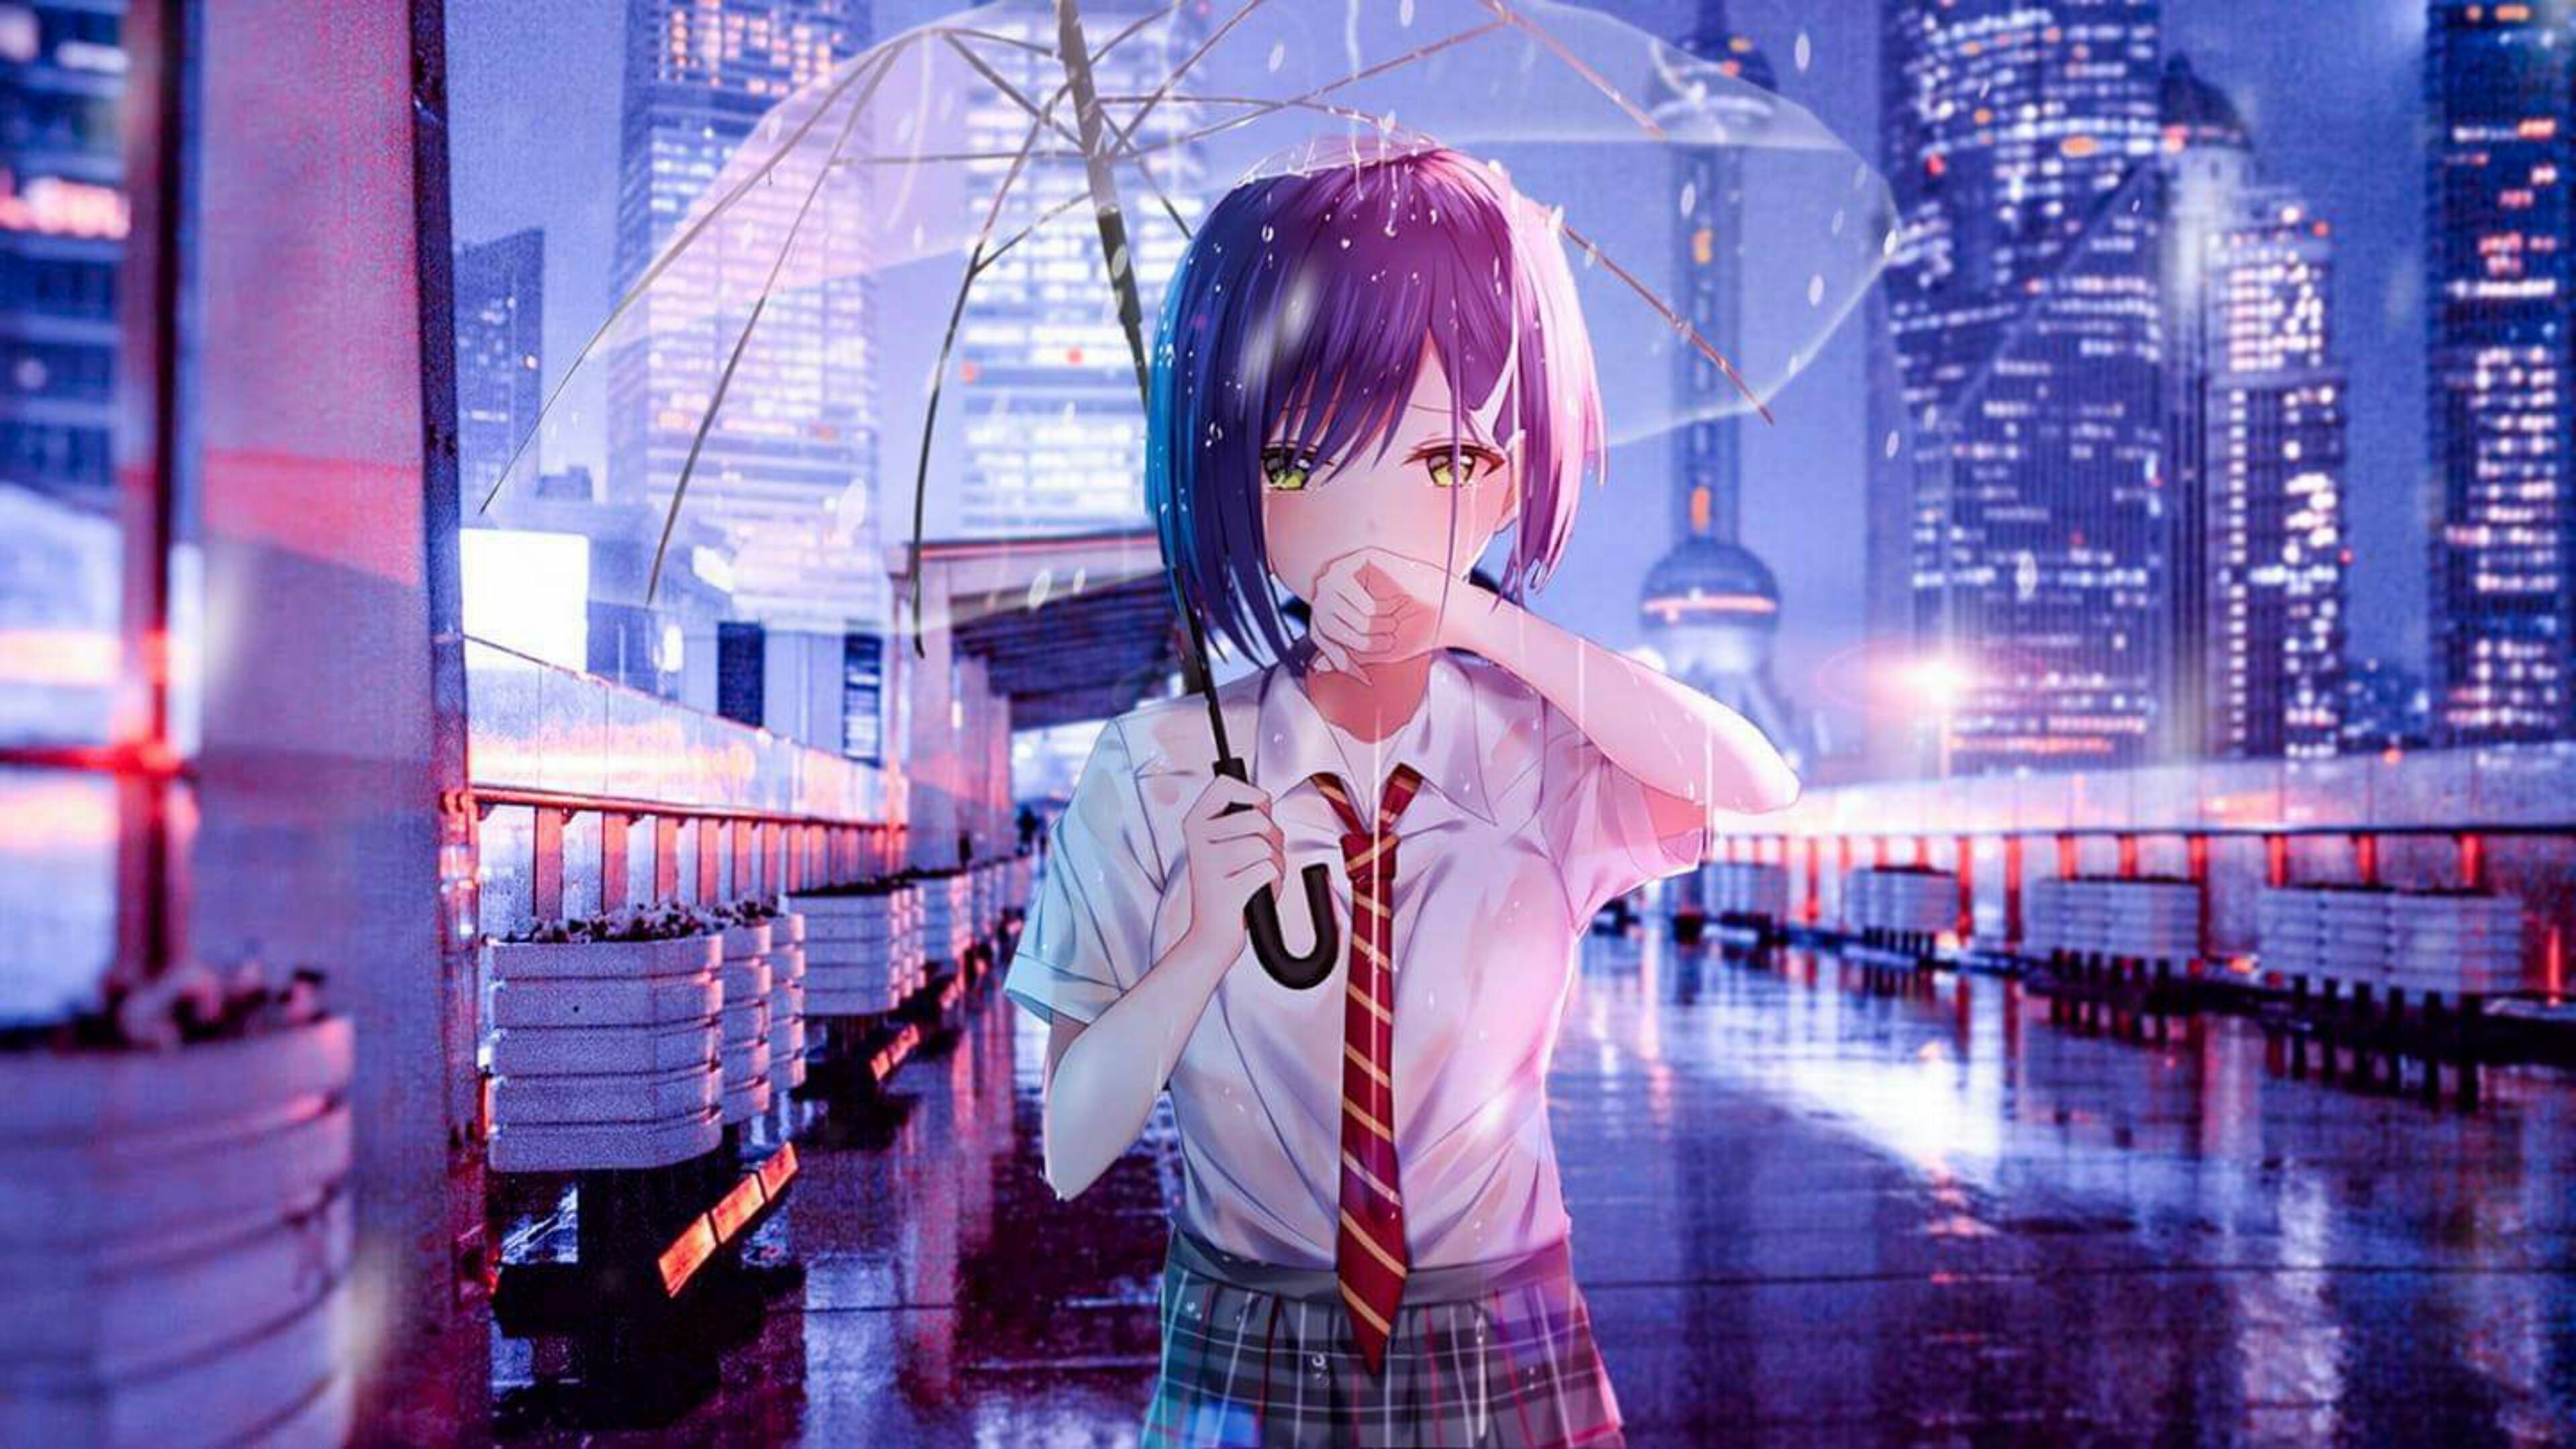 Ichigo Darling In The Franxx Ps4wallpapers Com